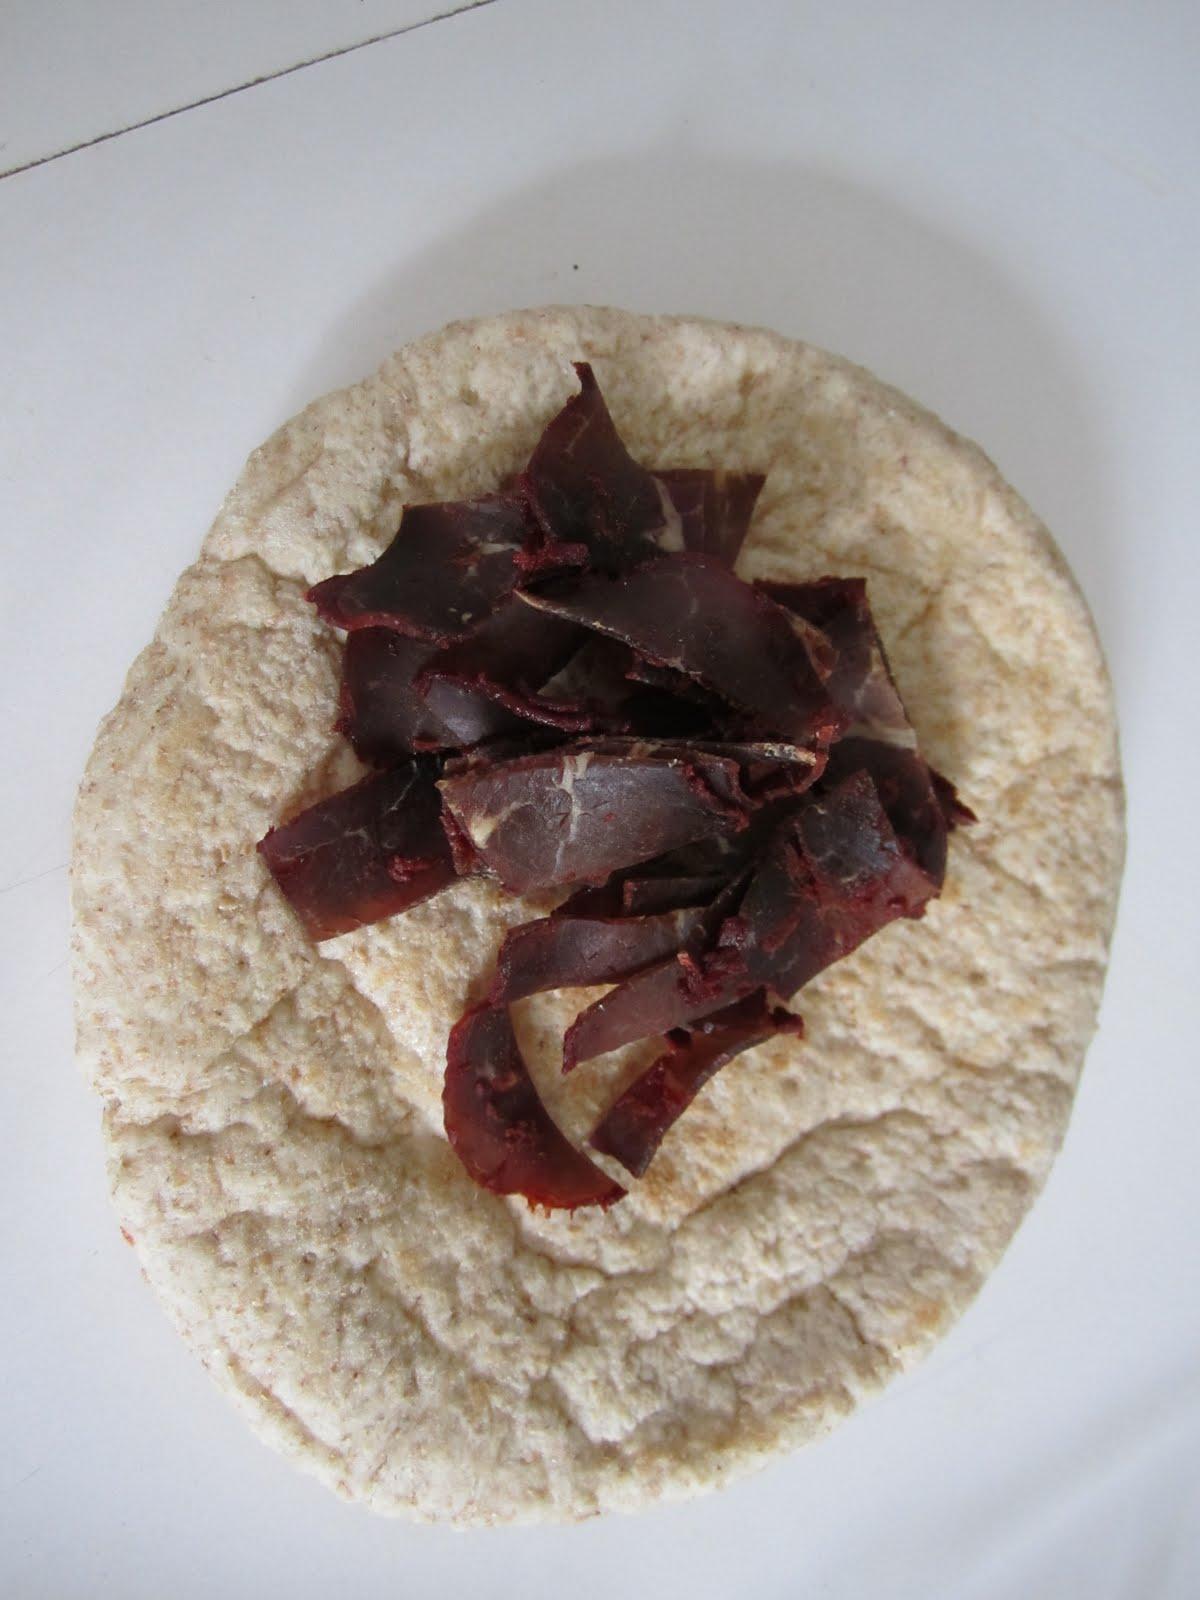 Basturma at home: recipe 16